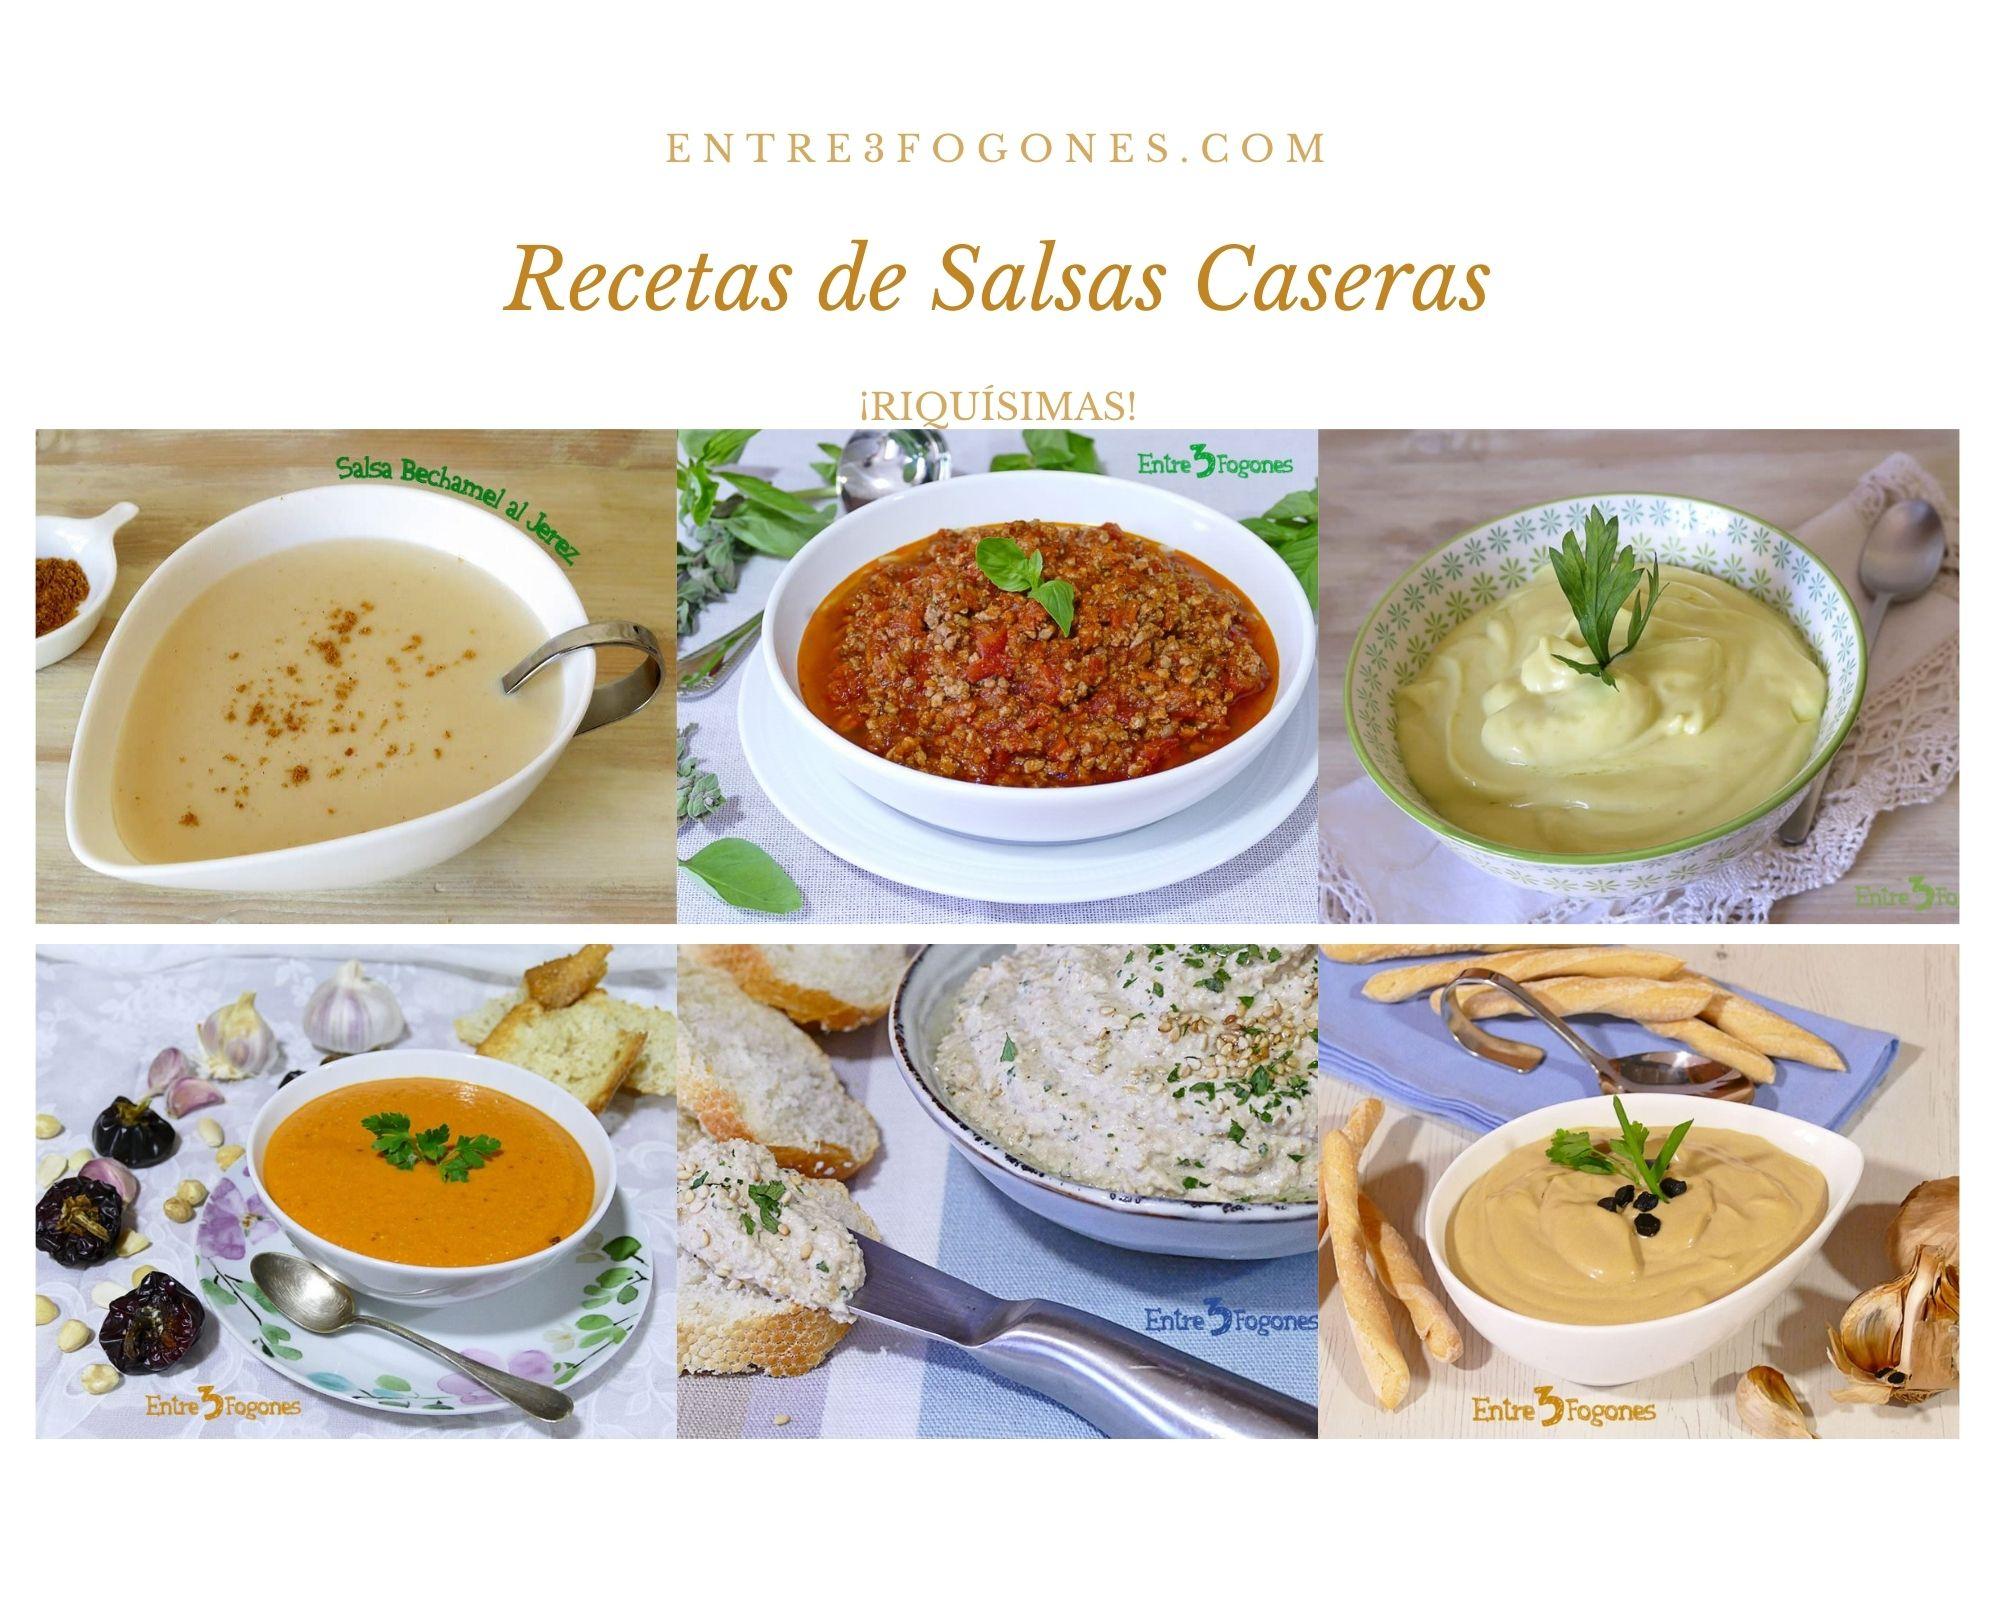 Recetas de Salsa Casera